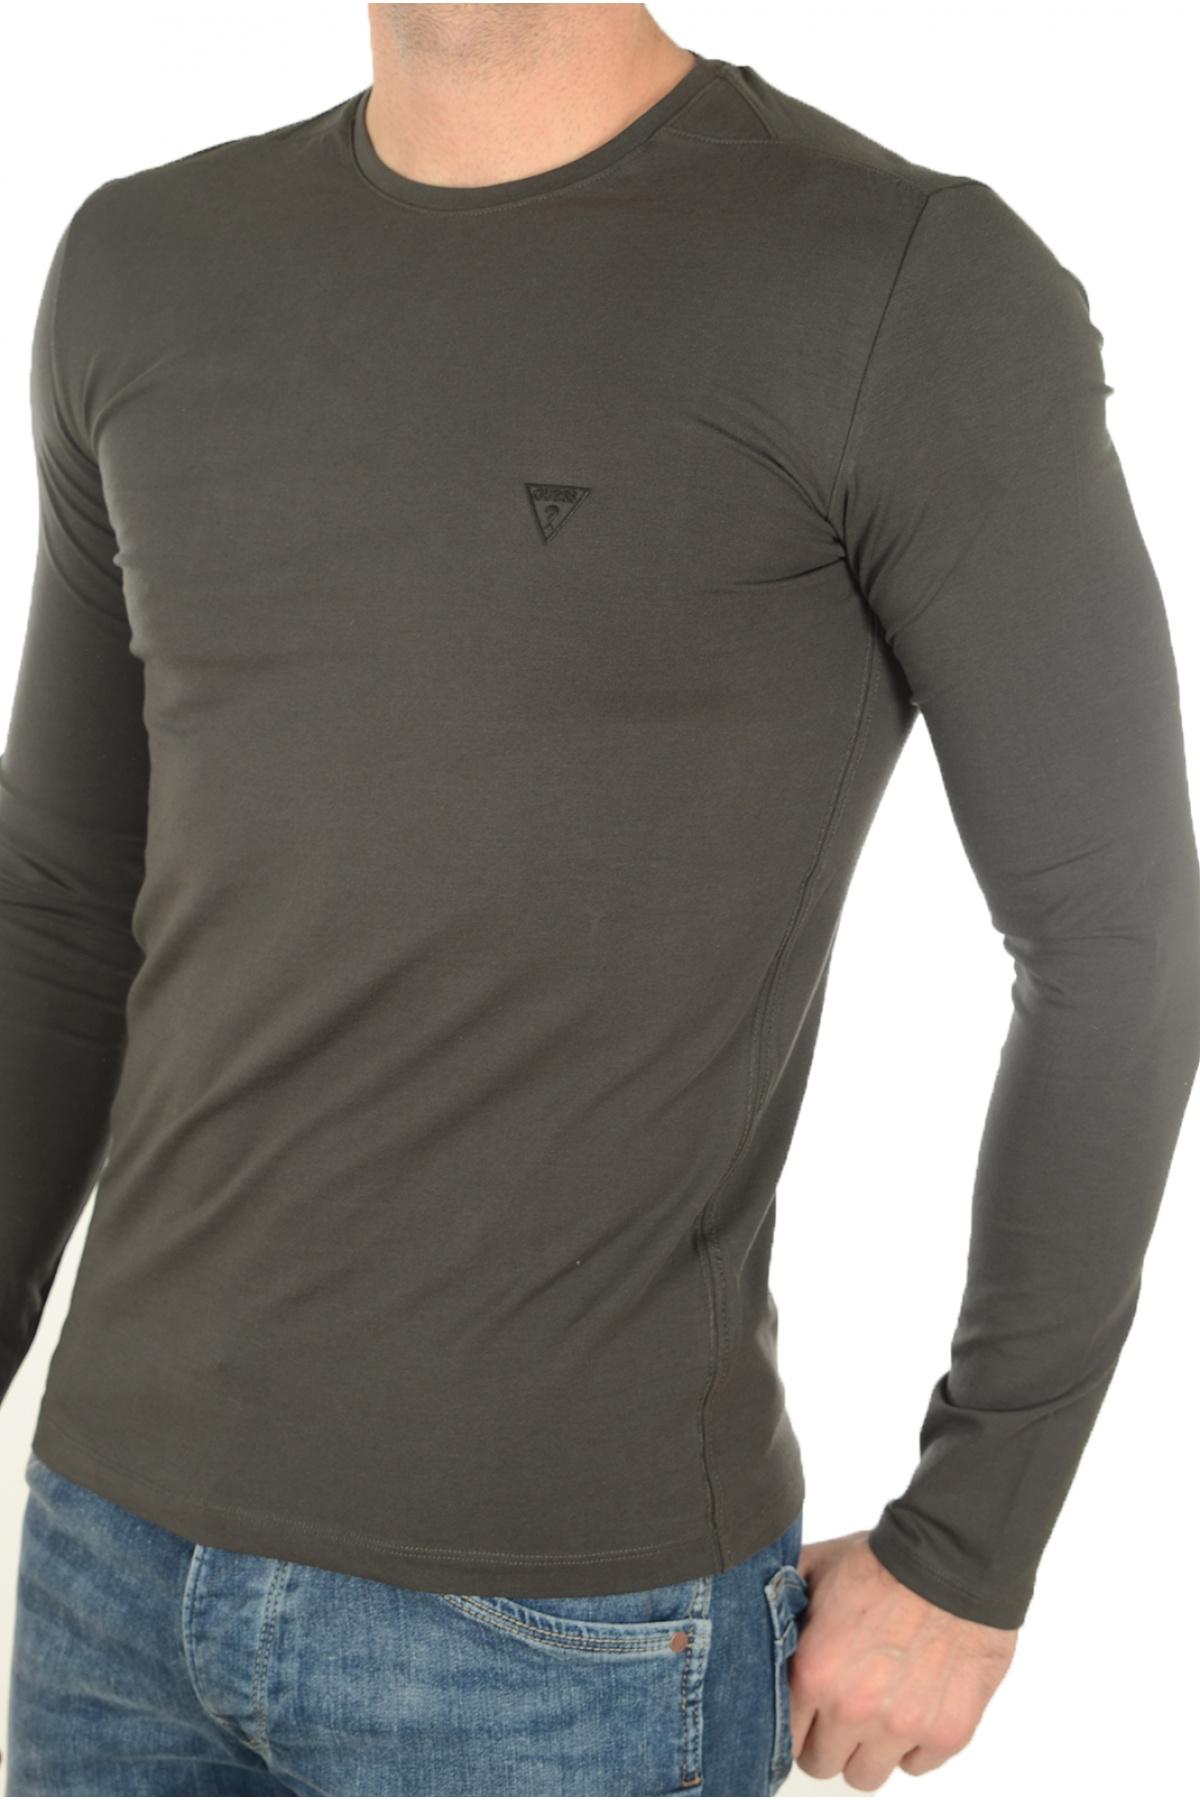 Tee-shirts Guess Jeans Homme Xxxl,xl,xxl